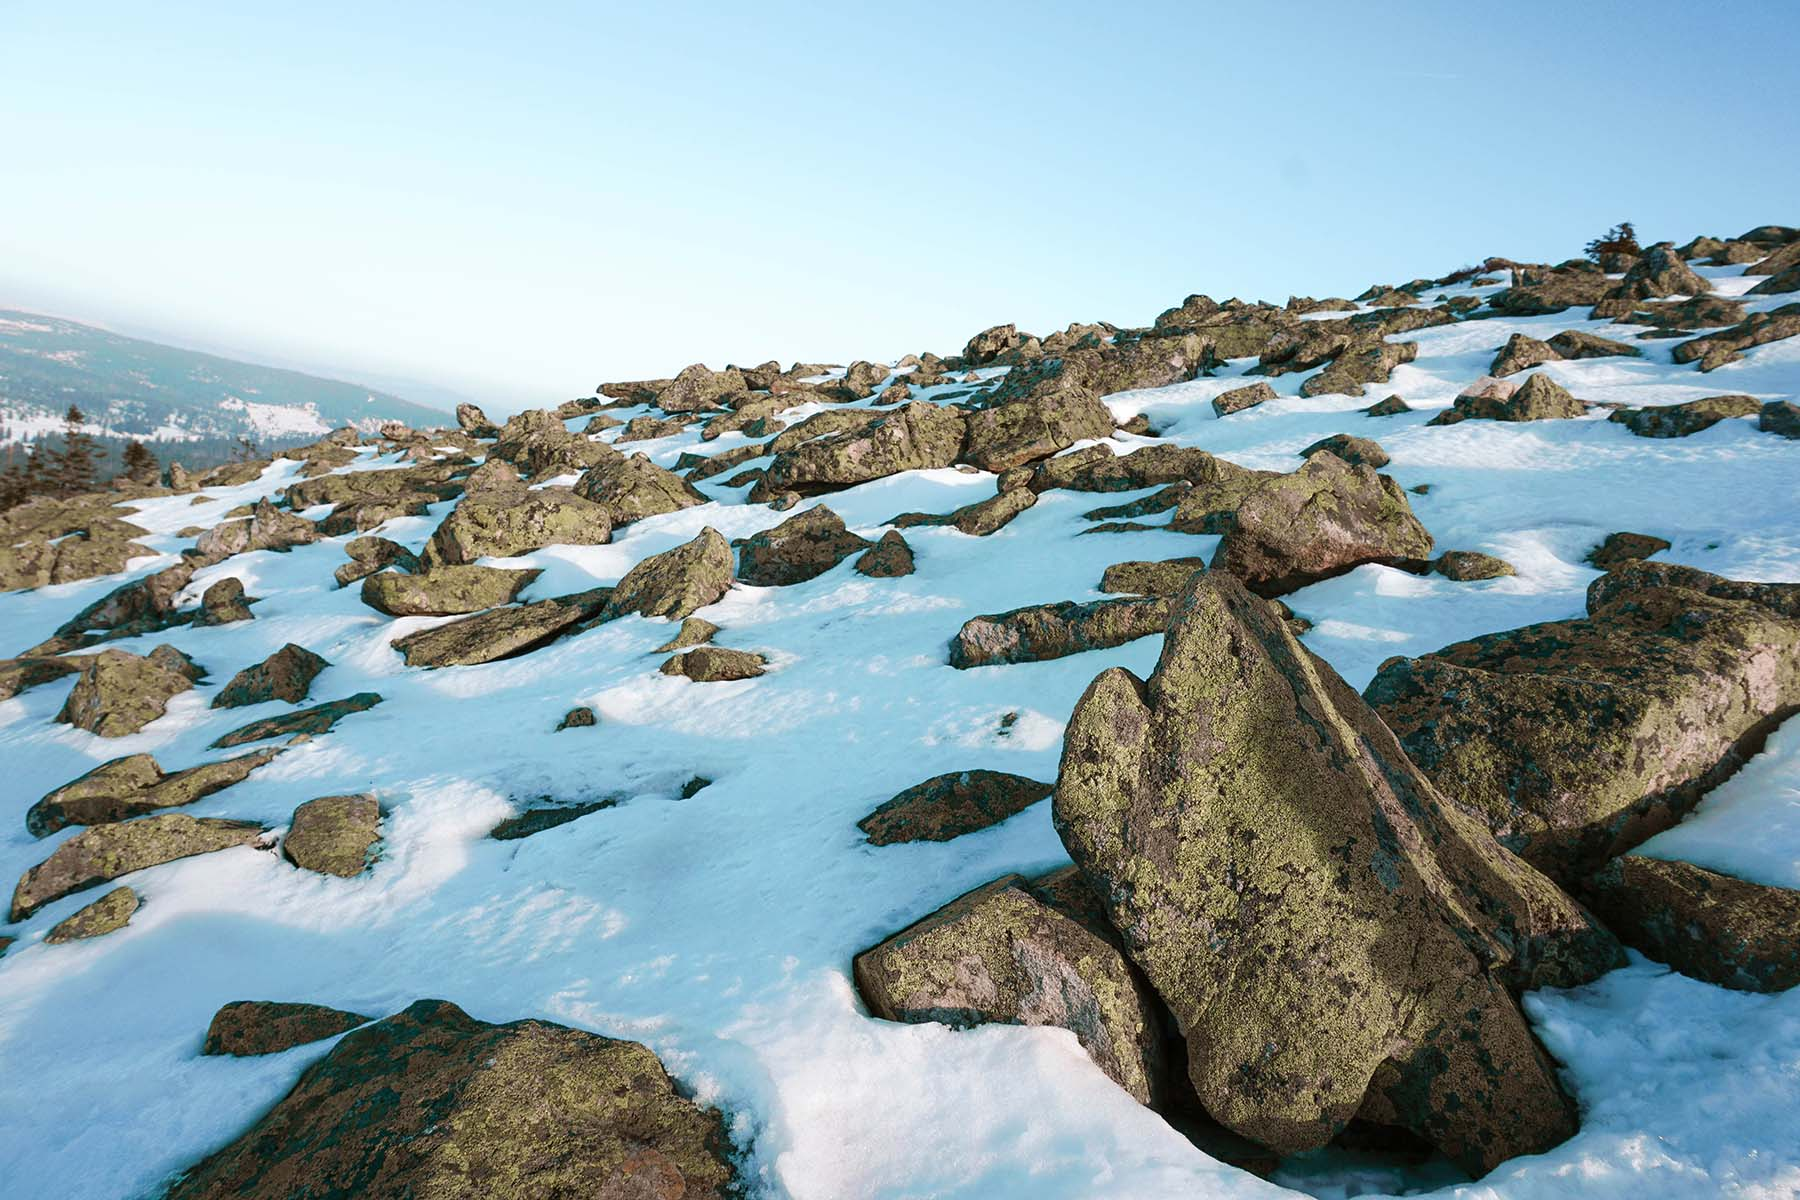 winterwanderung-lusen-blockmeer-schnee-winter